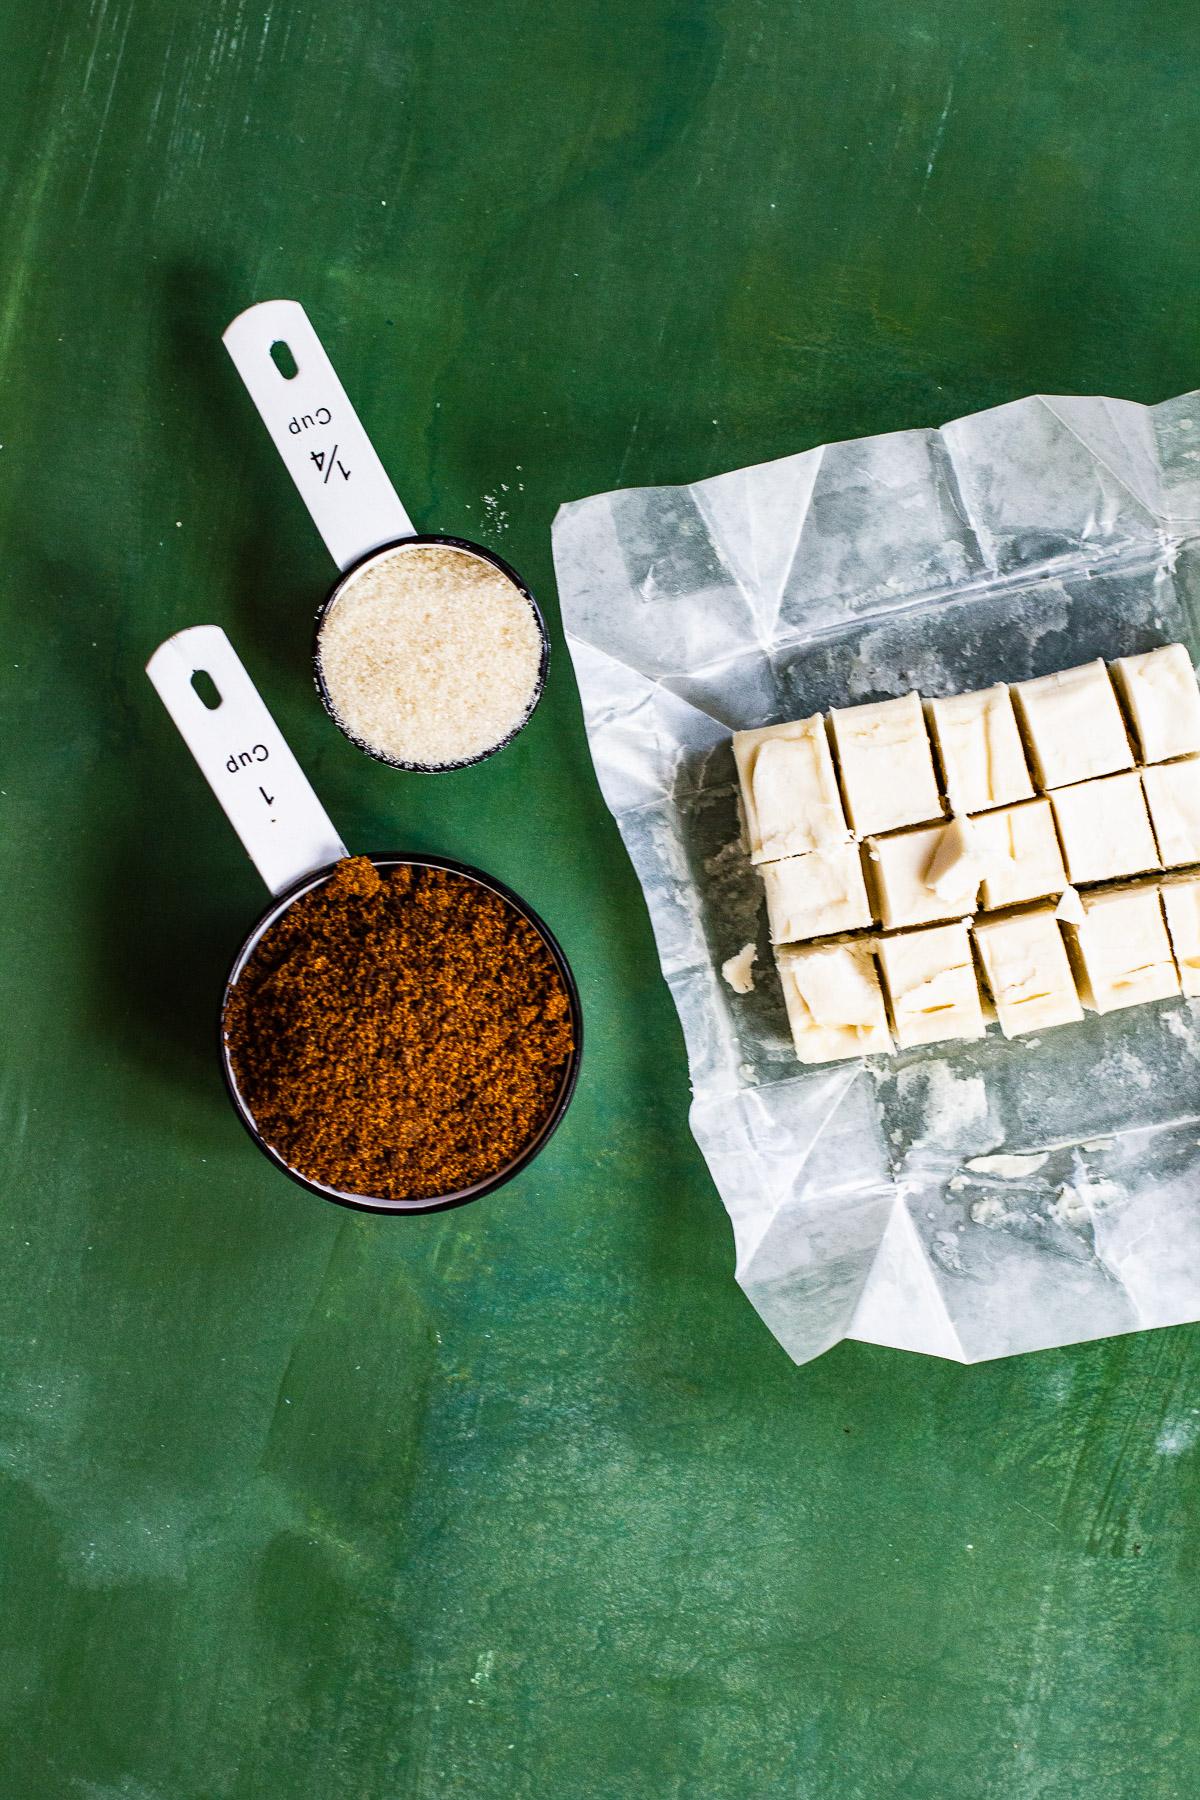 Basura Cookies - The Filipino Compost Cookie